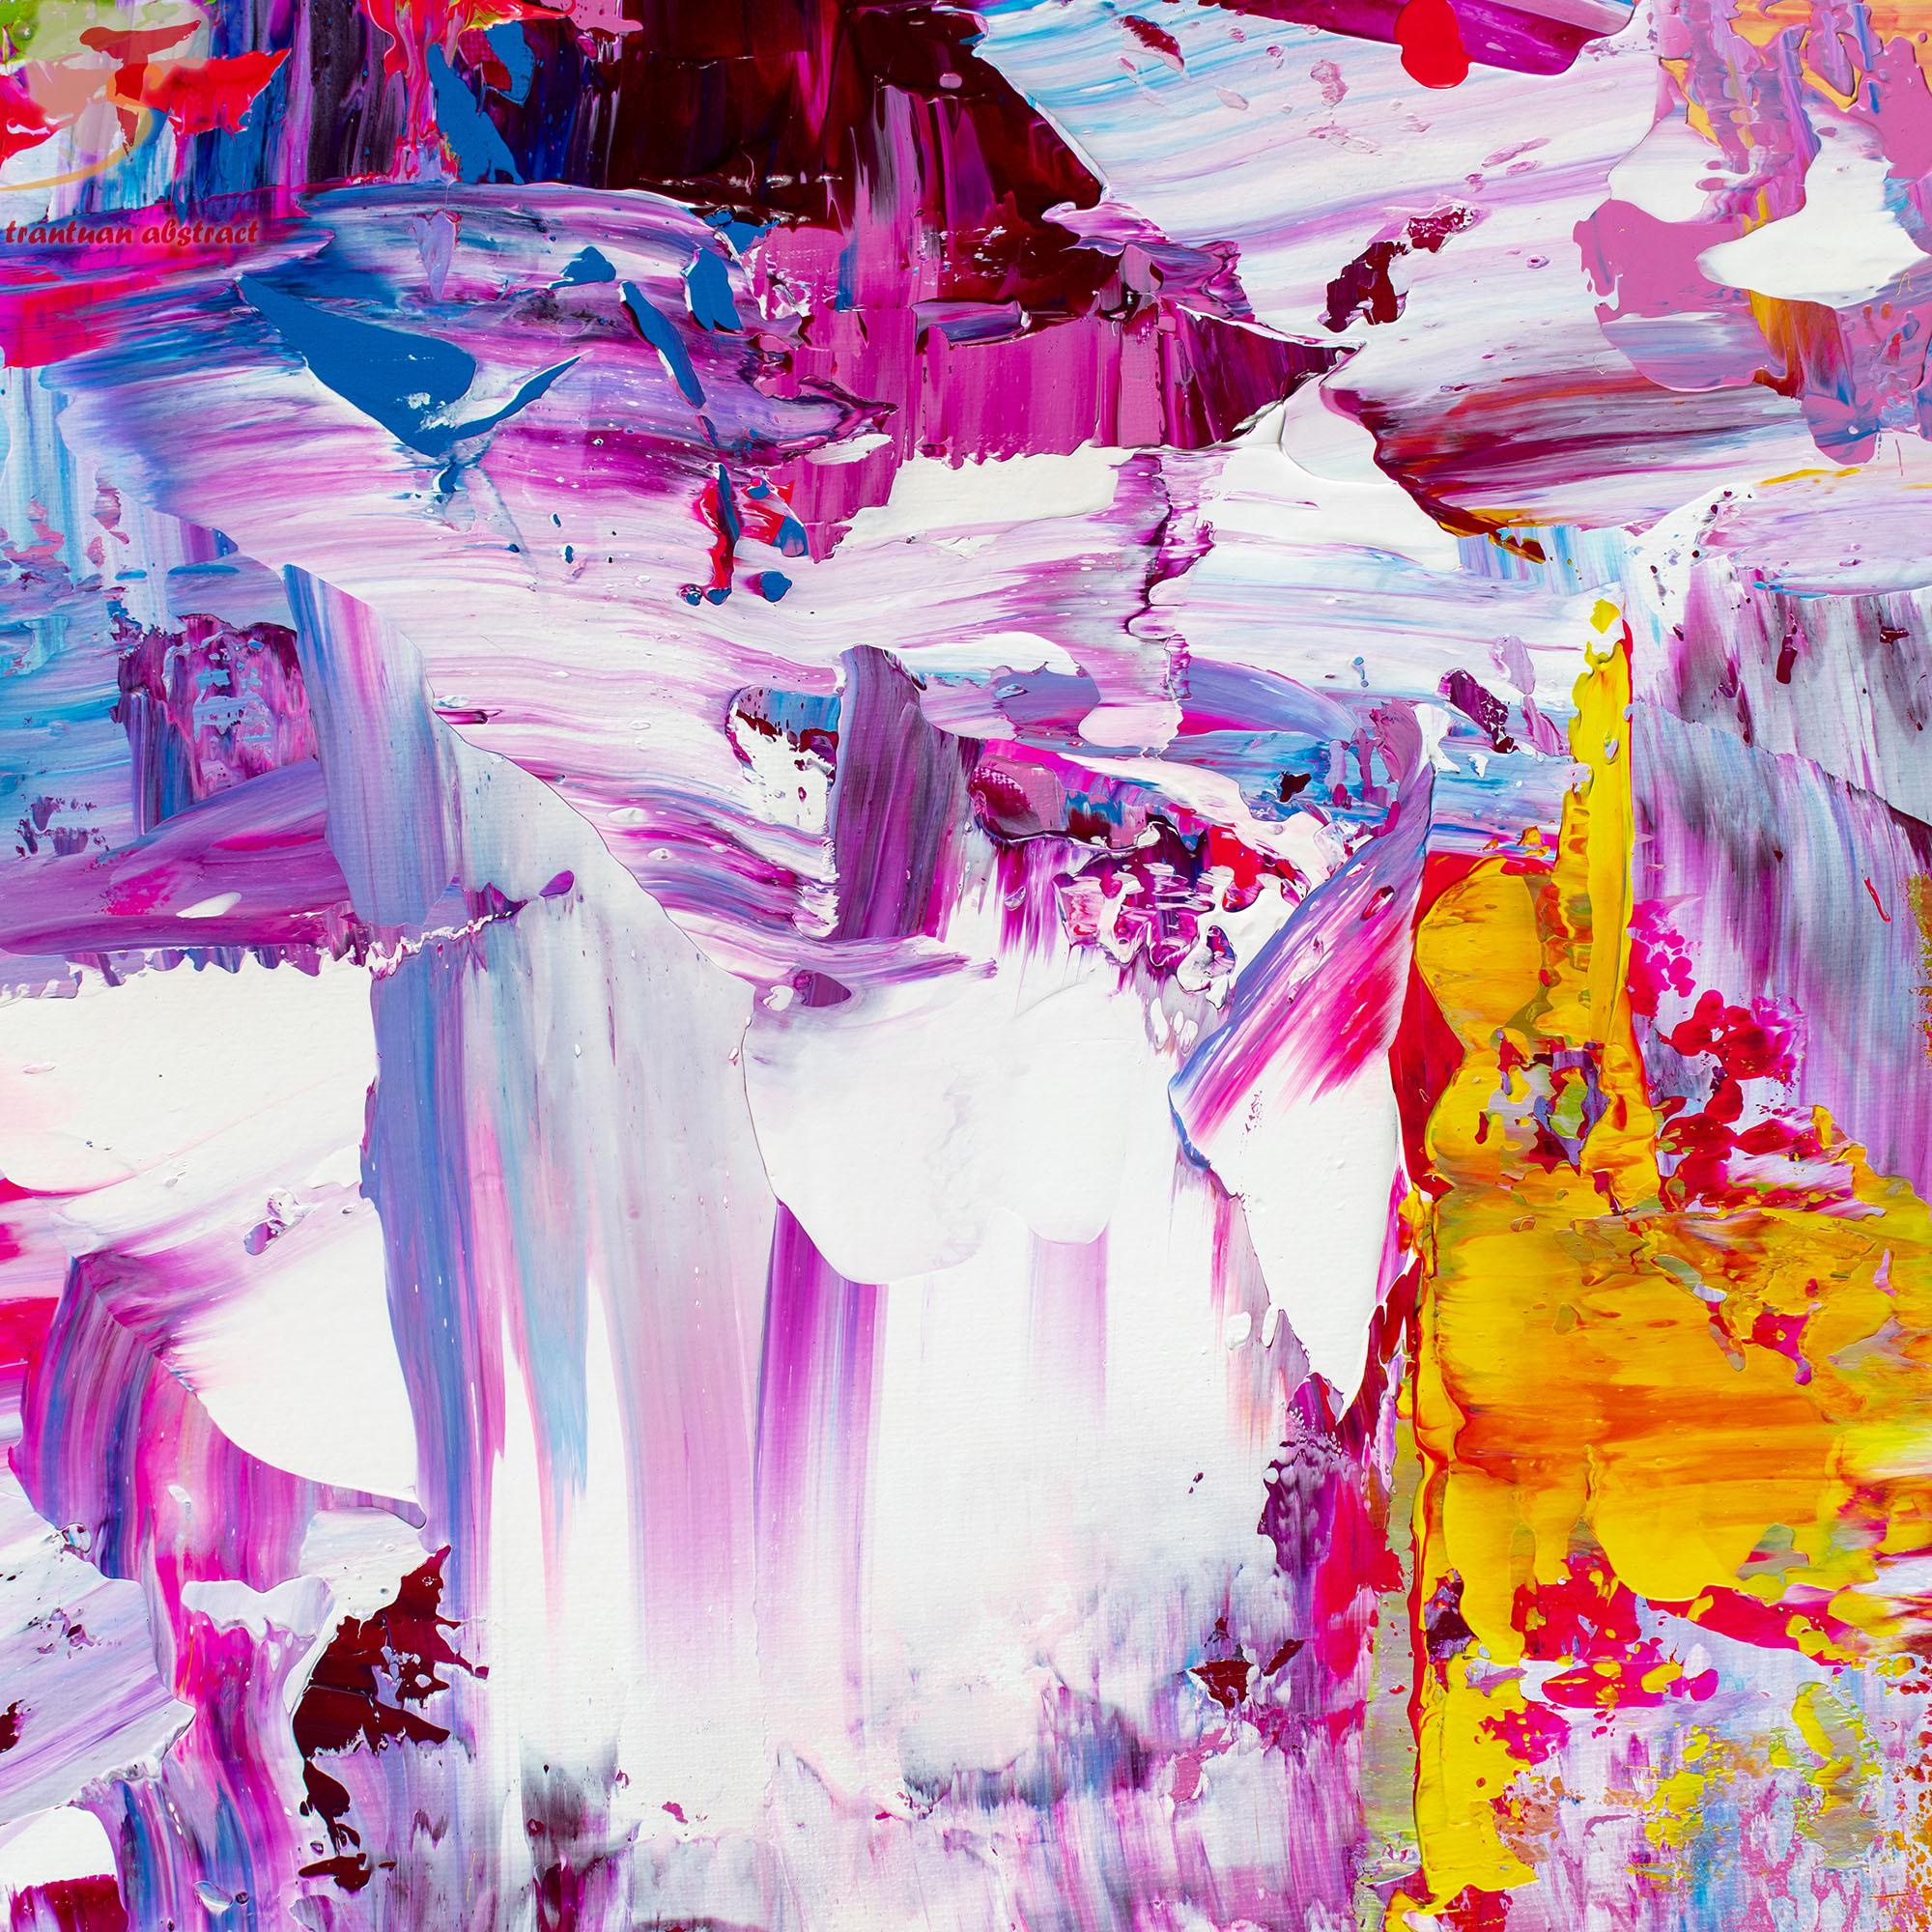 Tran Tuan Abstract Sparkling Sunlight 2021 135 x 80 x 5 cm Acrylic Painting Detail